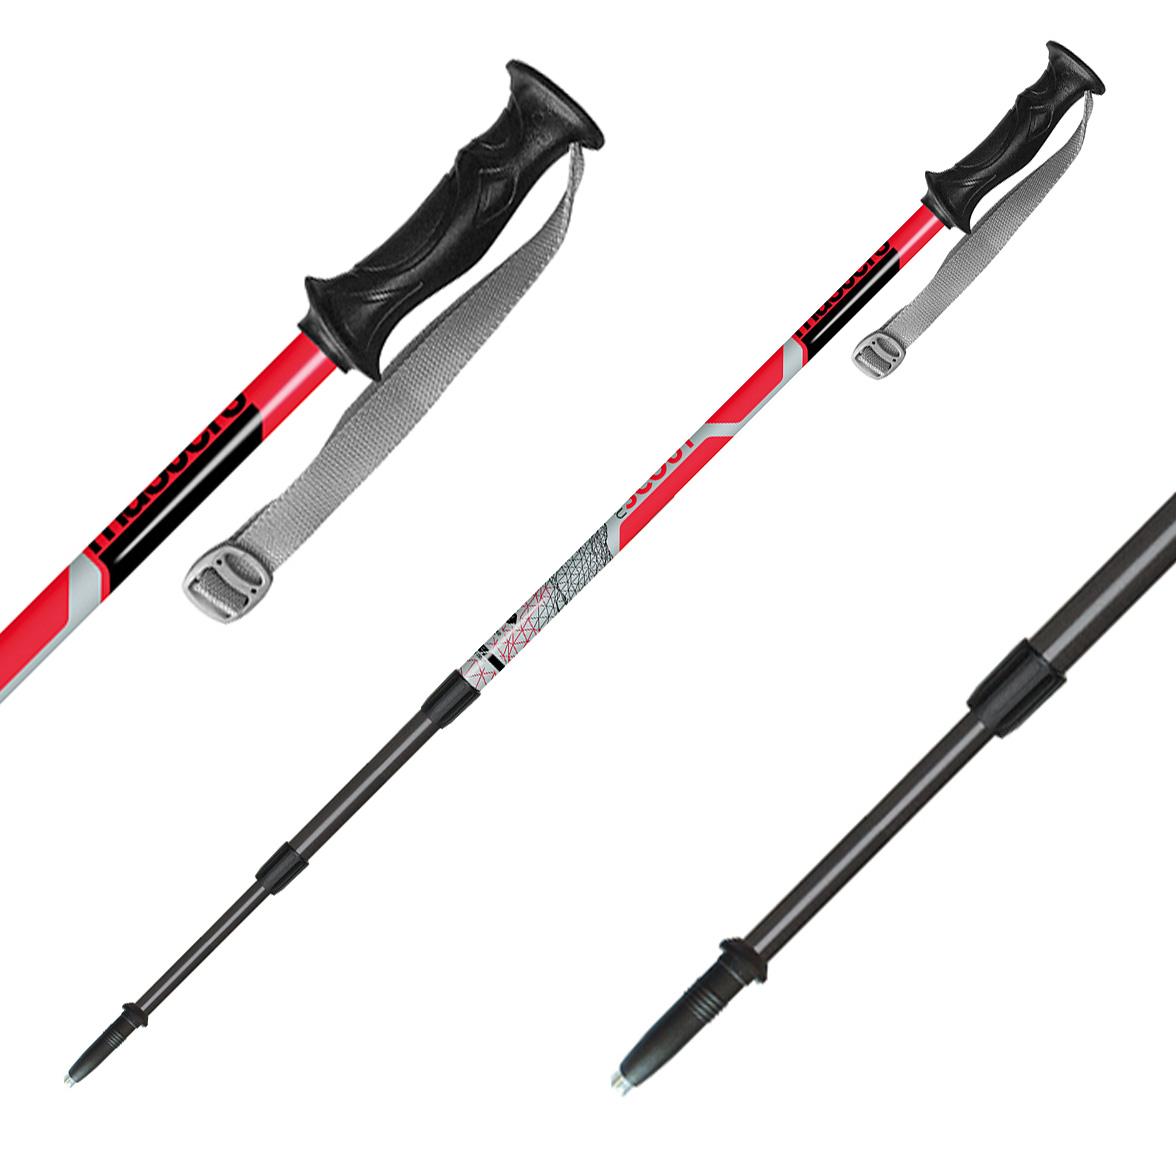 Телескопические палки, SCOUT RED, RECREATIONAL BACKPAKING СЕРИЯ 01S1716, Треккинговые палки - арт. 511140287